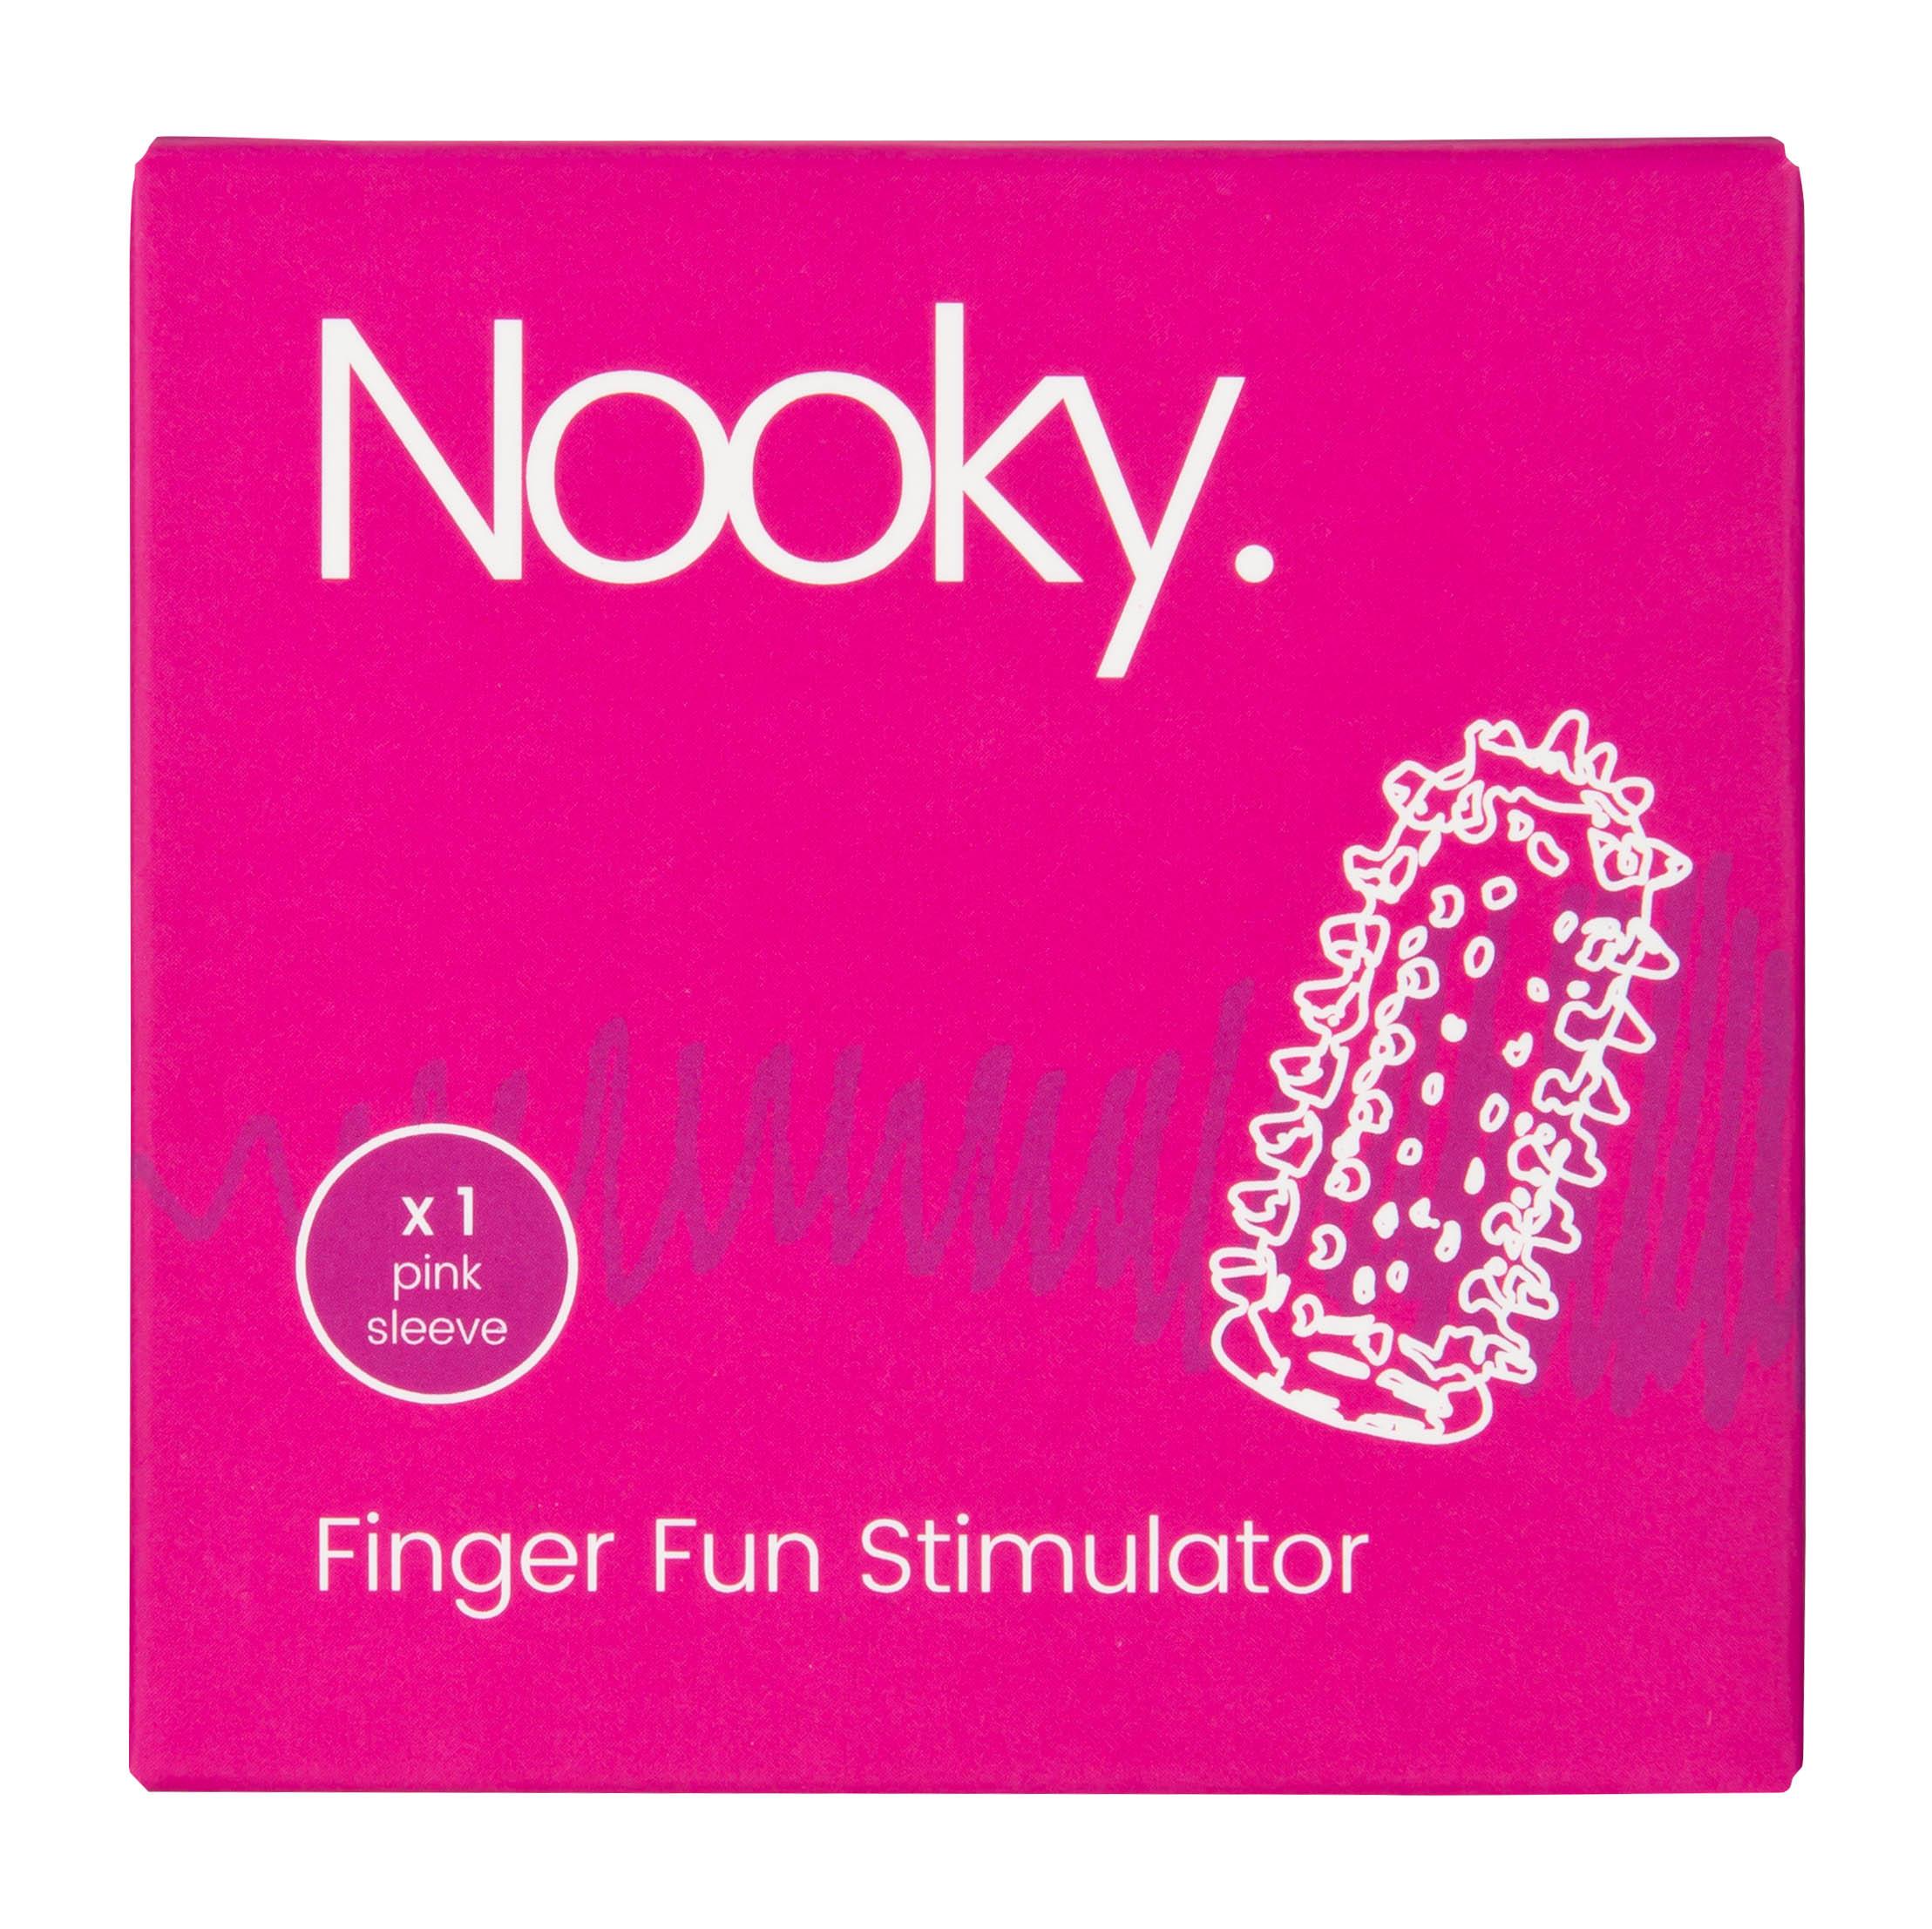 Nooky fun stimulator - 10p instore @ Poundstretcher (Nottingham)